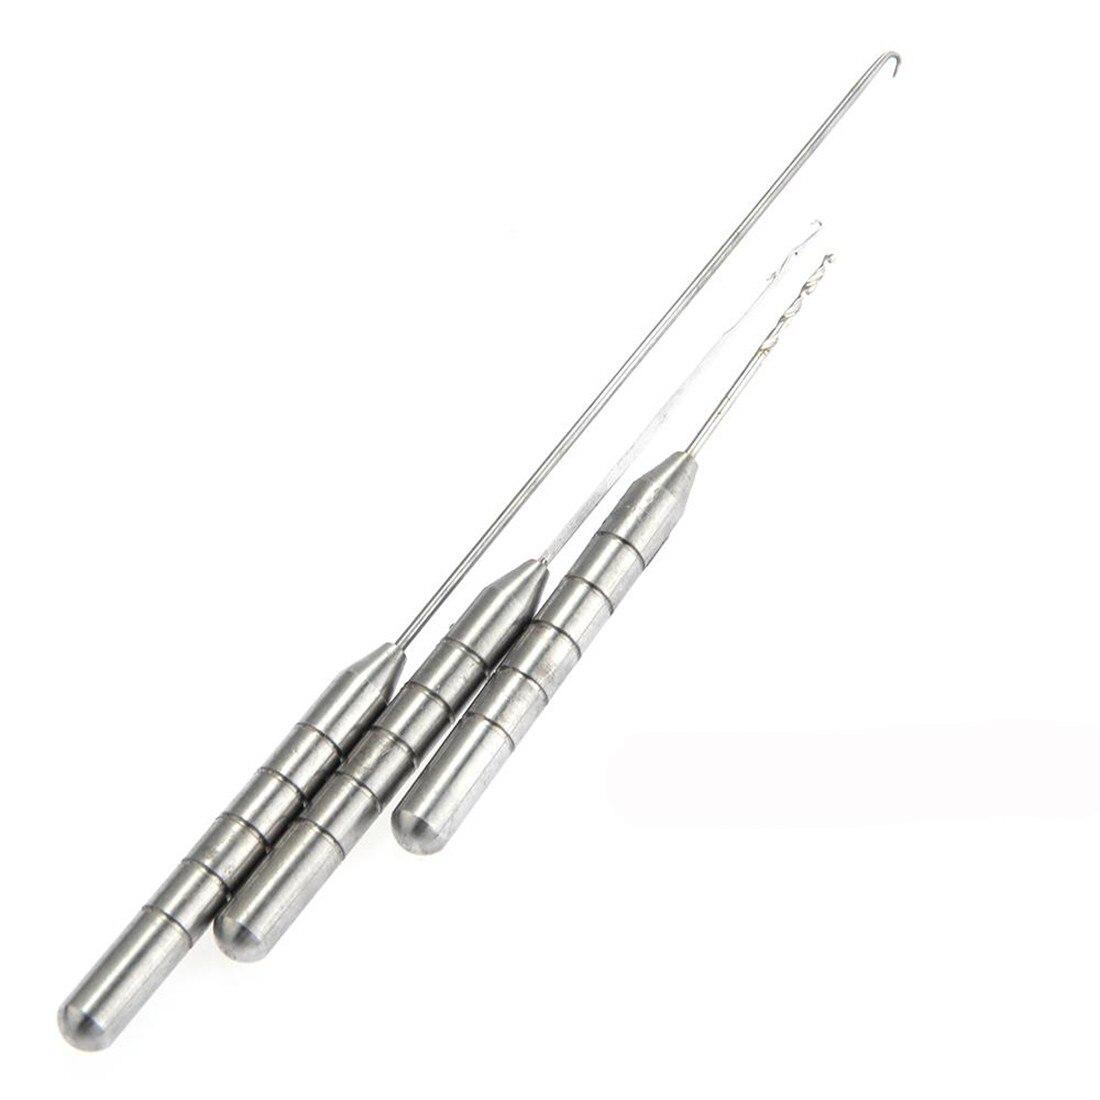 Hot Nice Sale High Quality Durable Coarse Fishing Carp Rigging Needle Set Kit Metal Tackle Tool